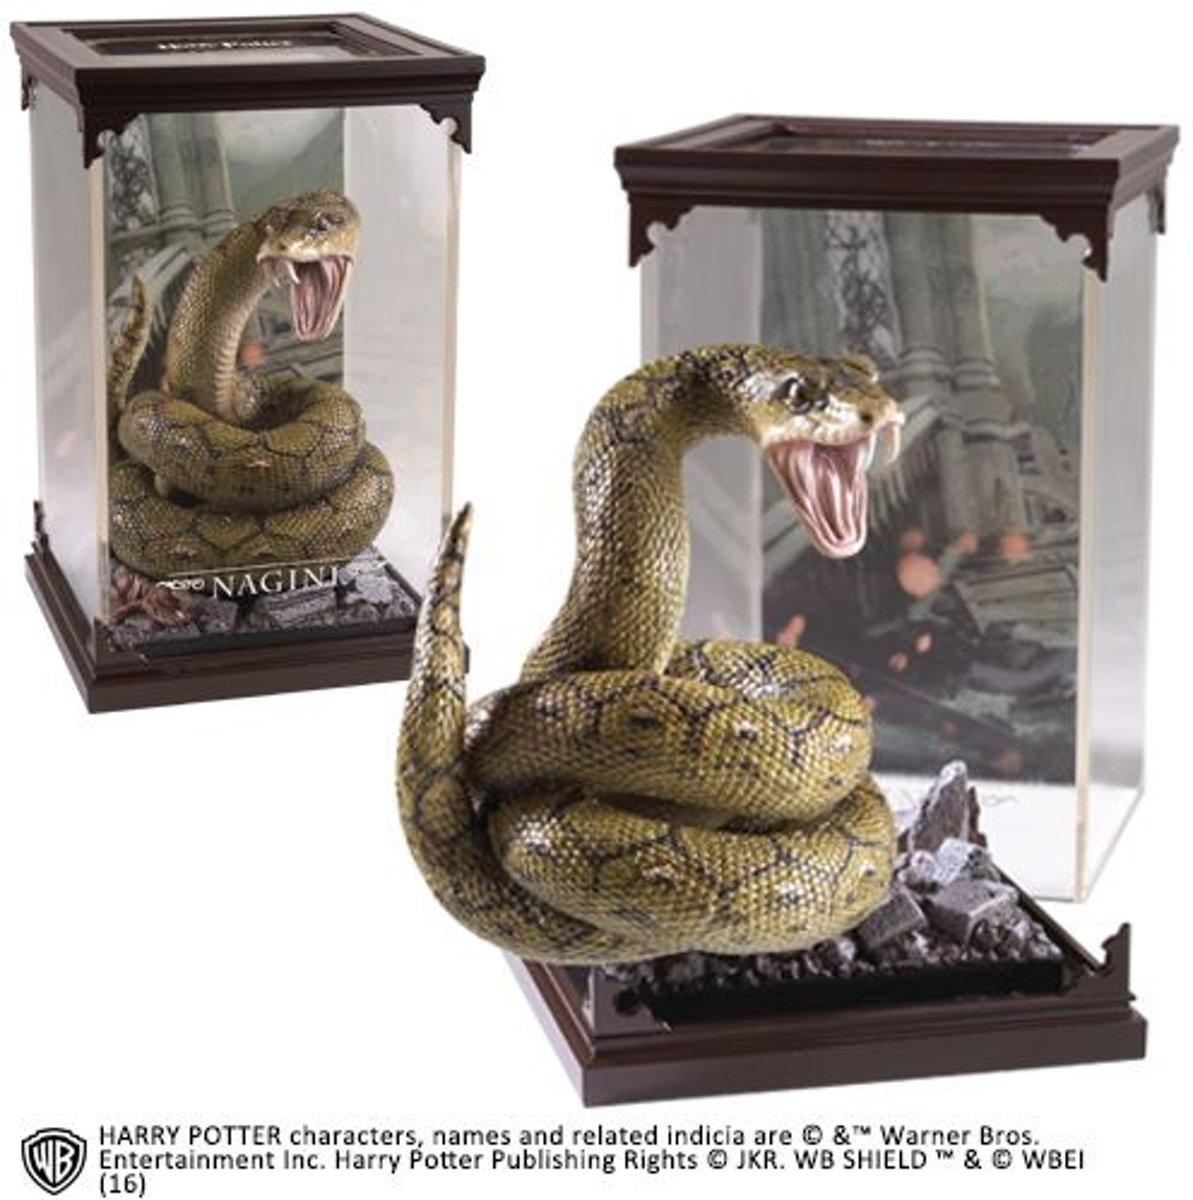 Harry Potter - Fantastic Beasts - Magical Creatures - Nagini kopen